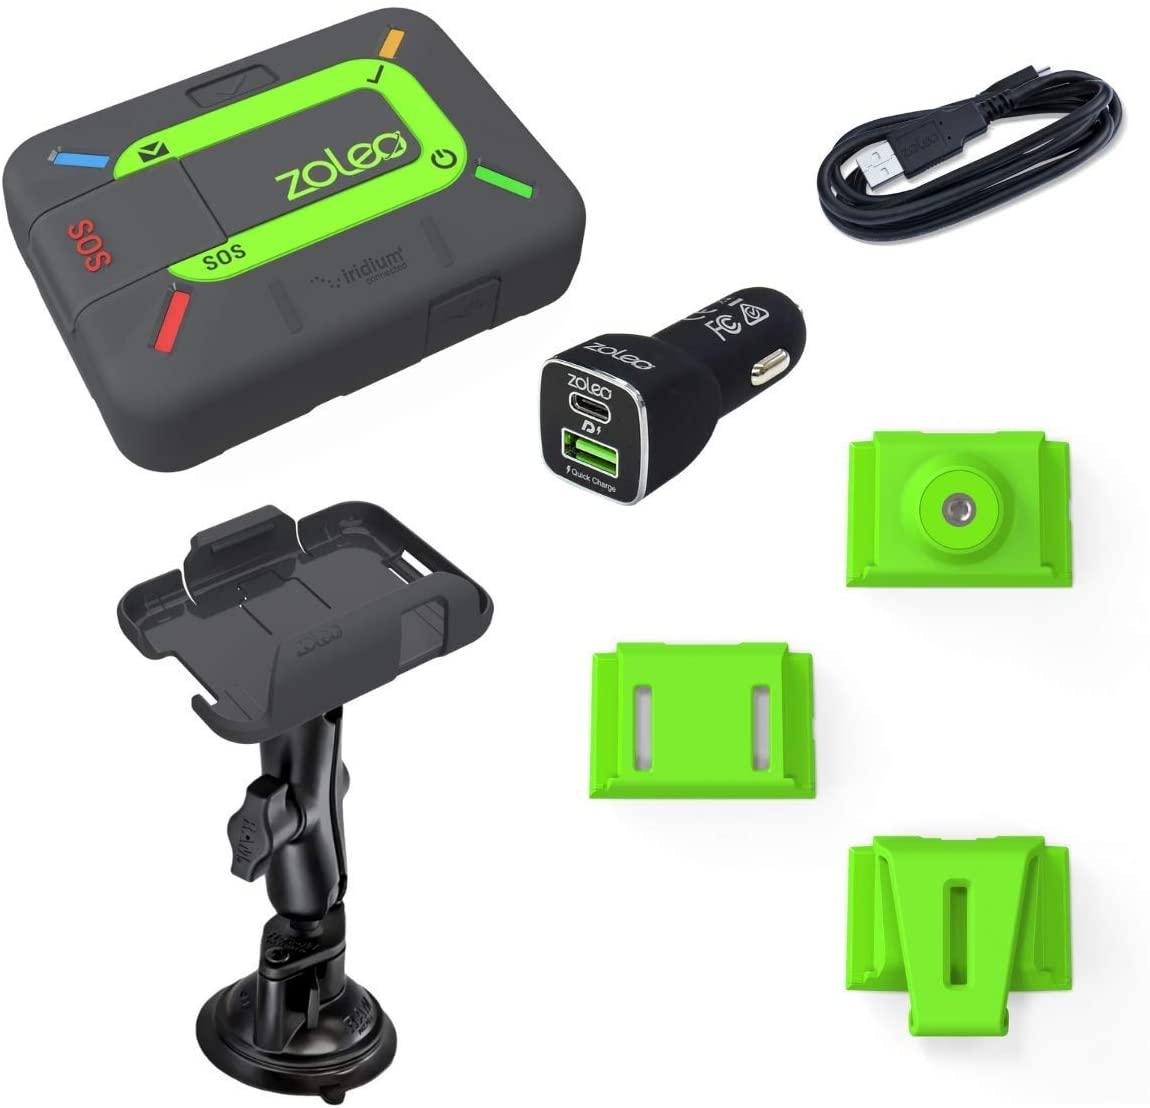 ZOLEO 위성 커뮤니케이터 양방향 글로벌 SMS 텍스트 메신저 및 이메일 비상 SOS 경고 체크인 및 GPS 유니버설 마운트 액세서리 키트 ? RAM 마운트 DC 자동차 충전기 USB 케이블 크래들 키트